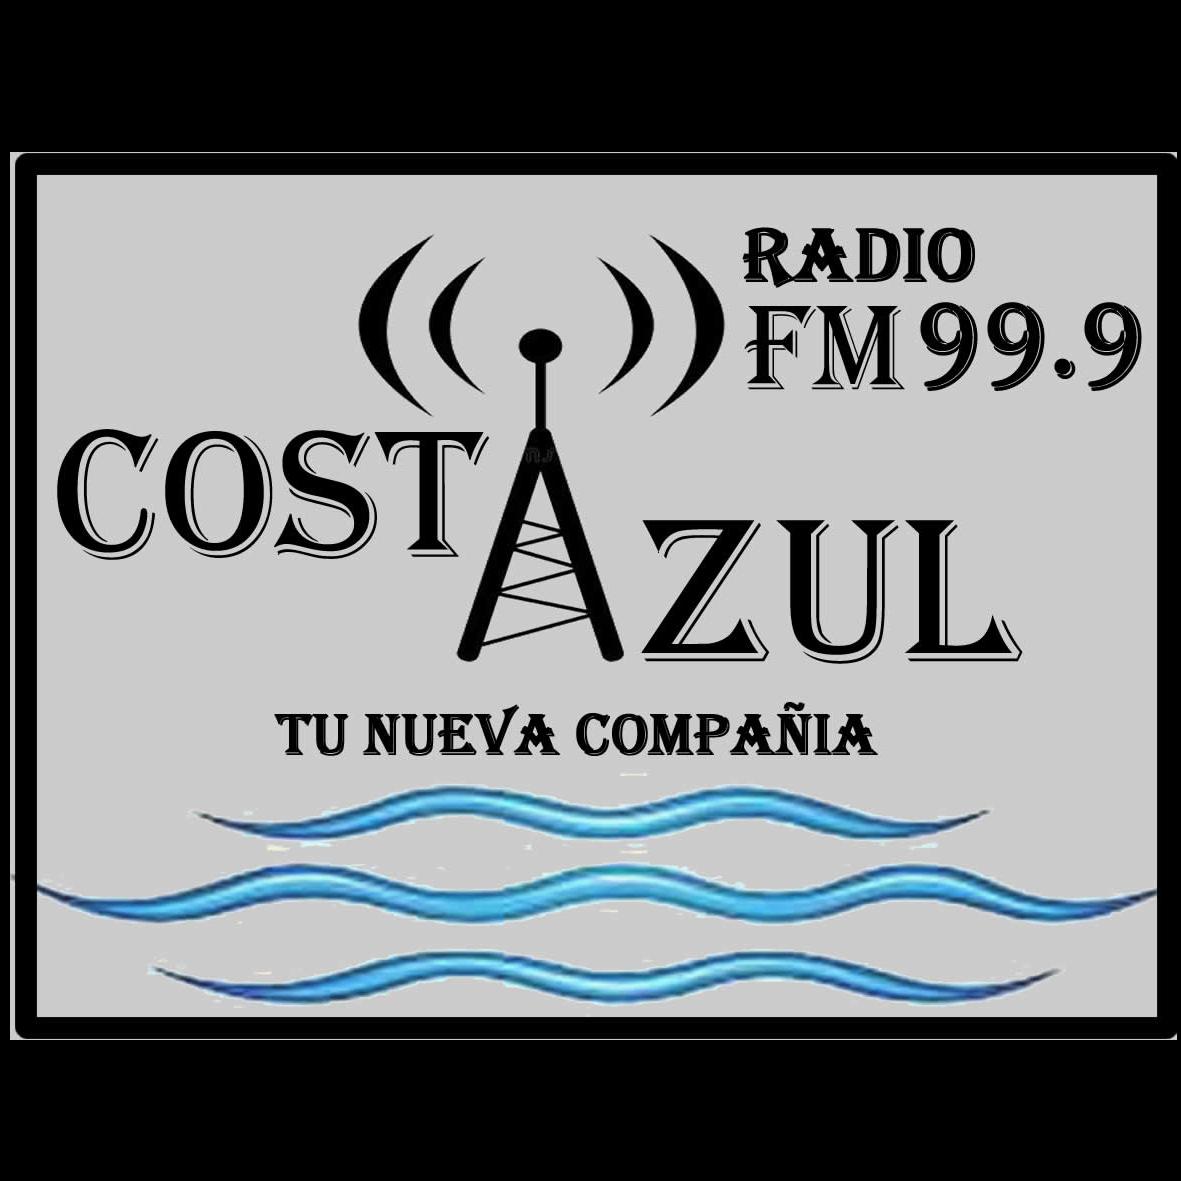 costa azul radio